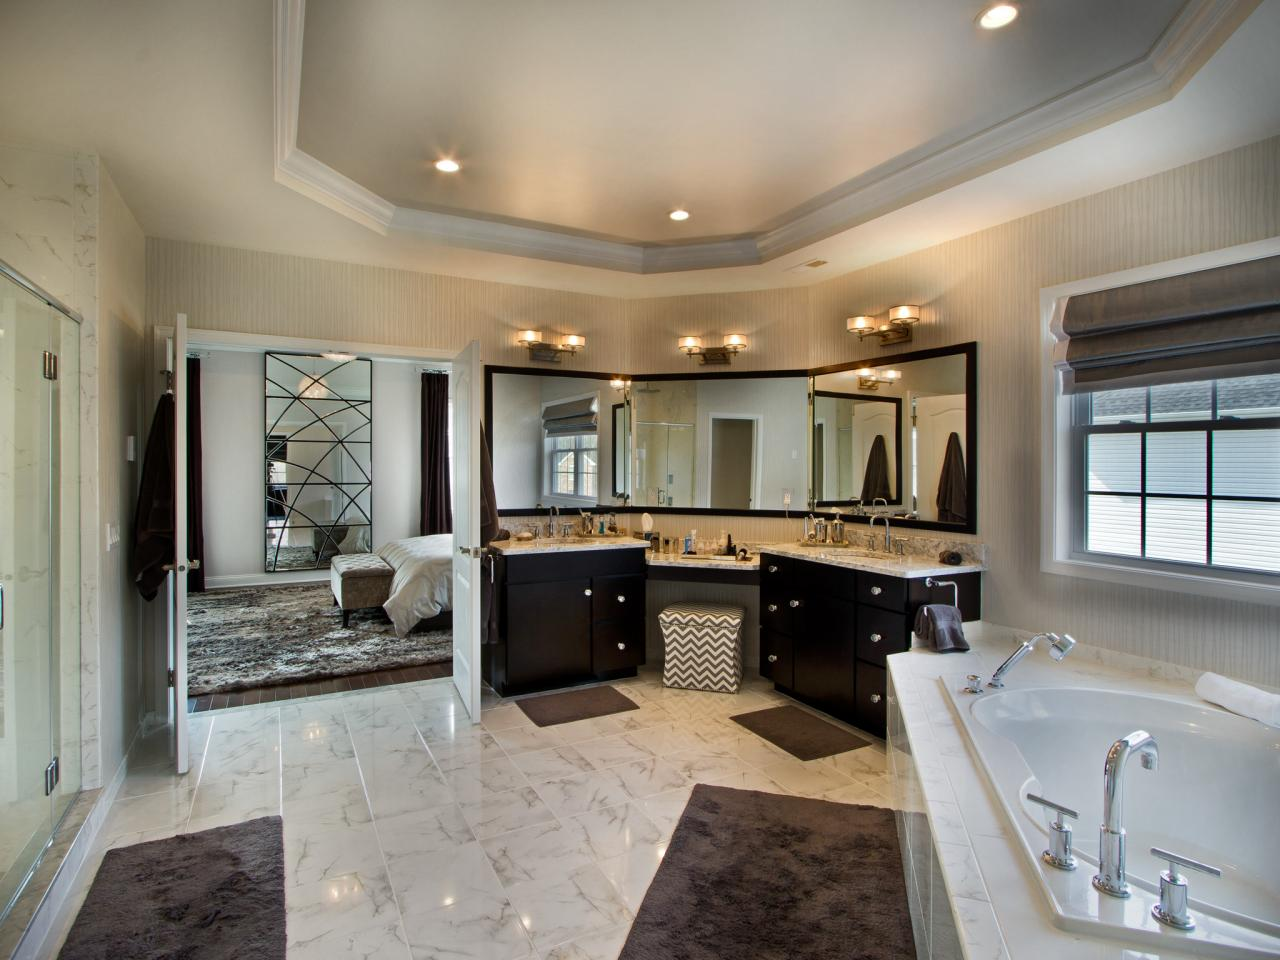 25 Extraordinary Master Bathroom Designs on Master Bathroom Remodel Ideas  id=87927